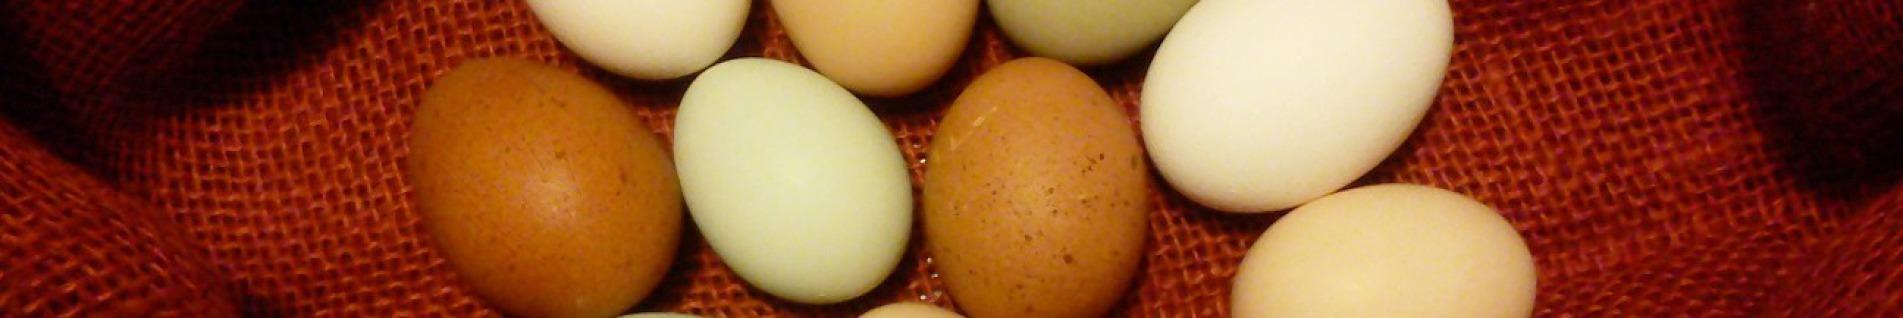 Hühnerhof Juesven